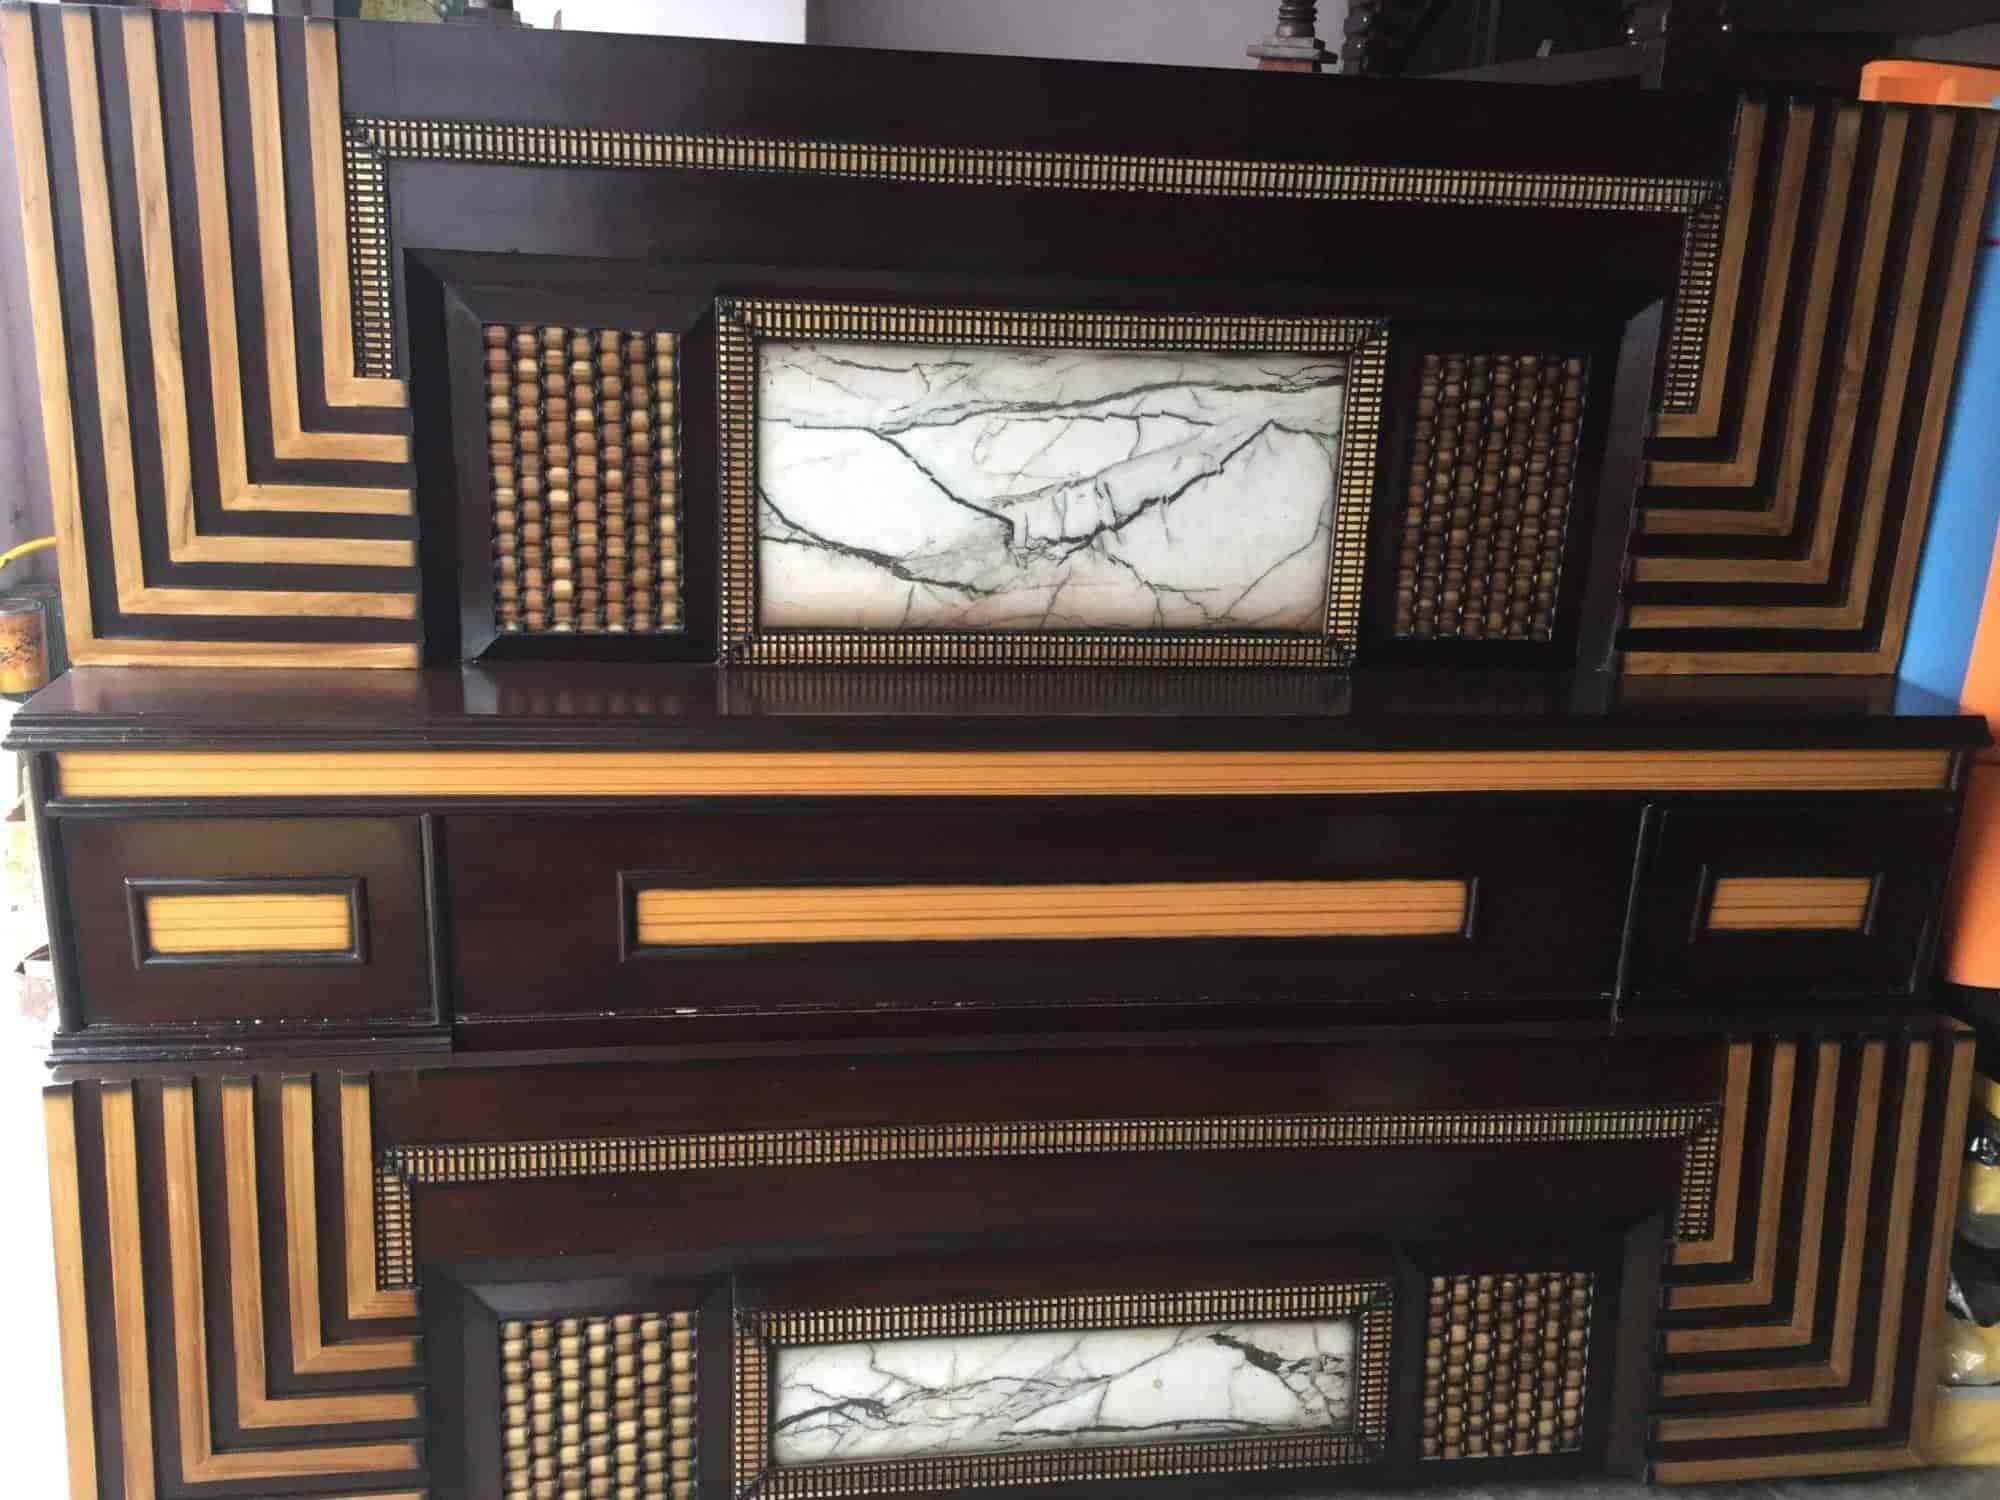 ... Wooden Furnitures   U. K. Furniture House Photos, Shah Ganj, Agra    Carpenters ...